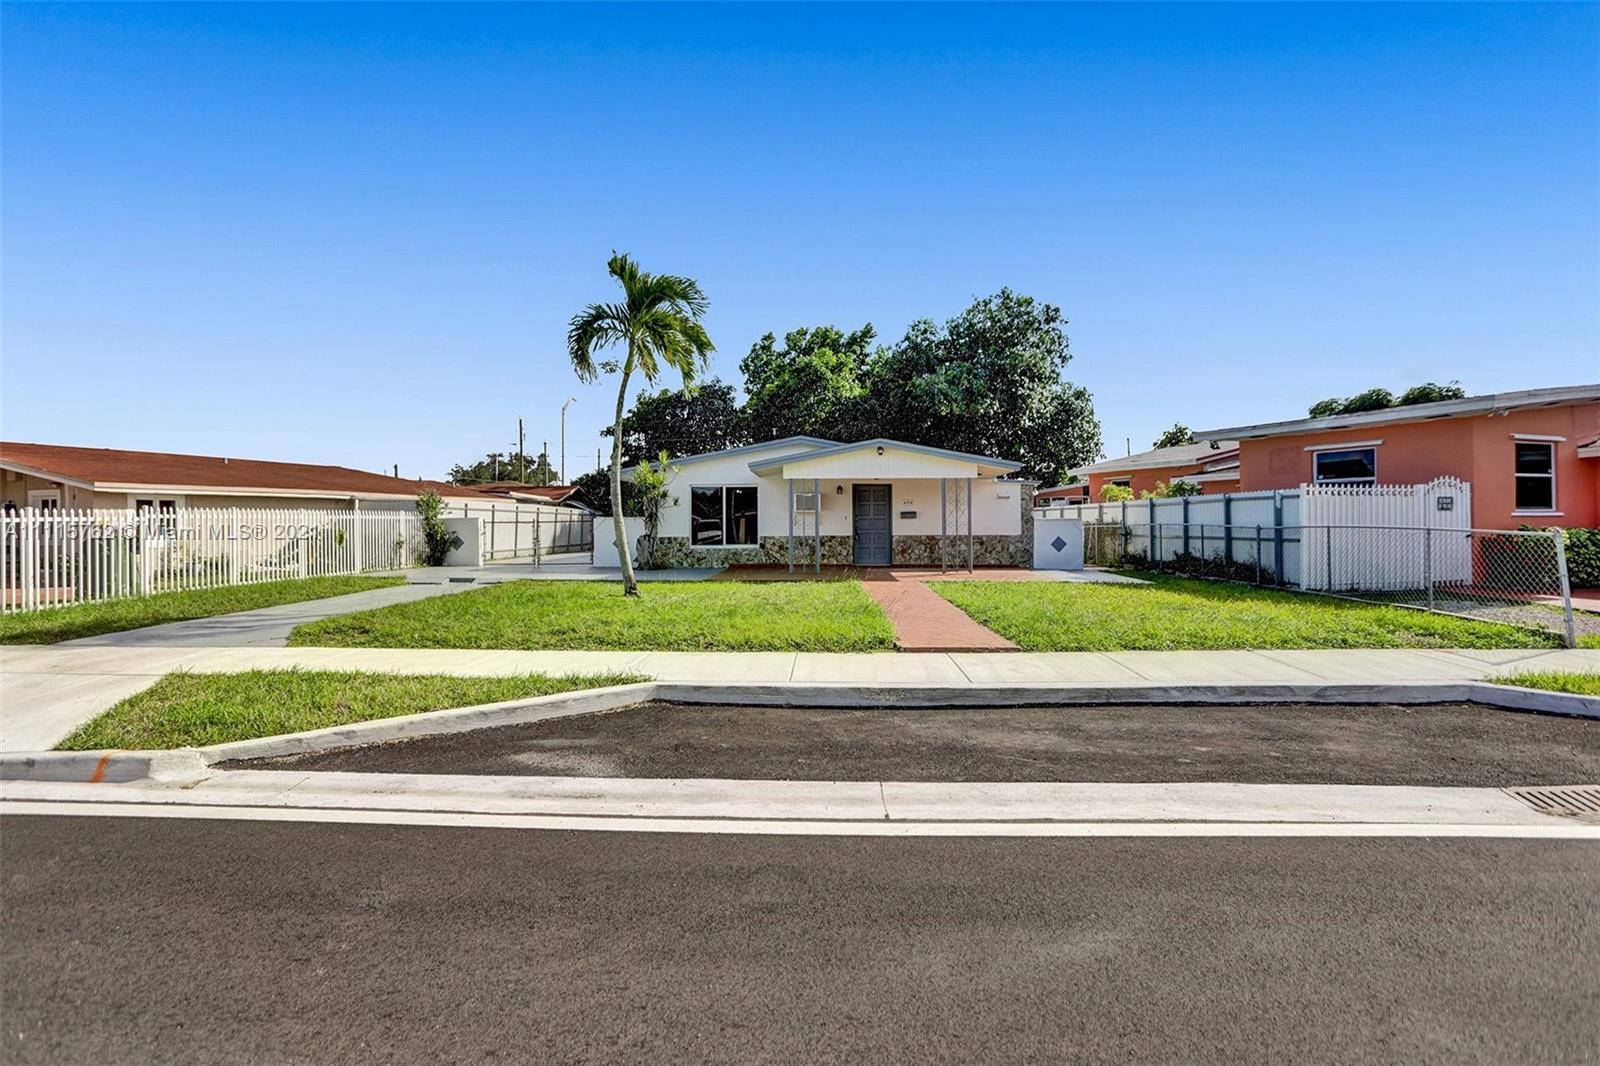 Single Family Home,For Sale,690 SE 3rd Pl, Hialeah, Florida 33010,Brickell,realty,broker,condos near me